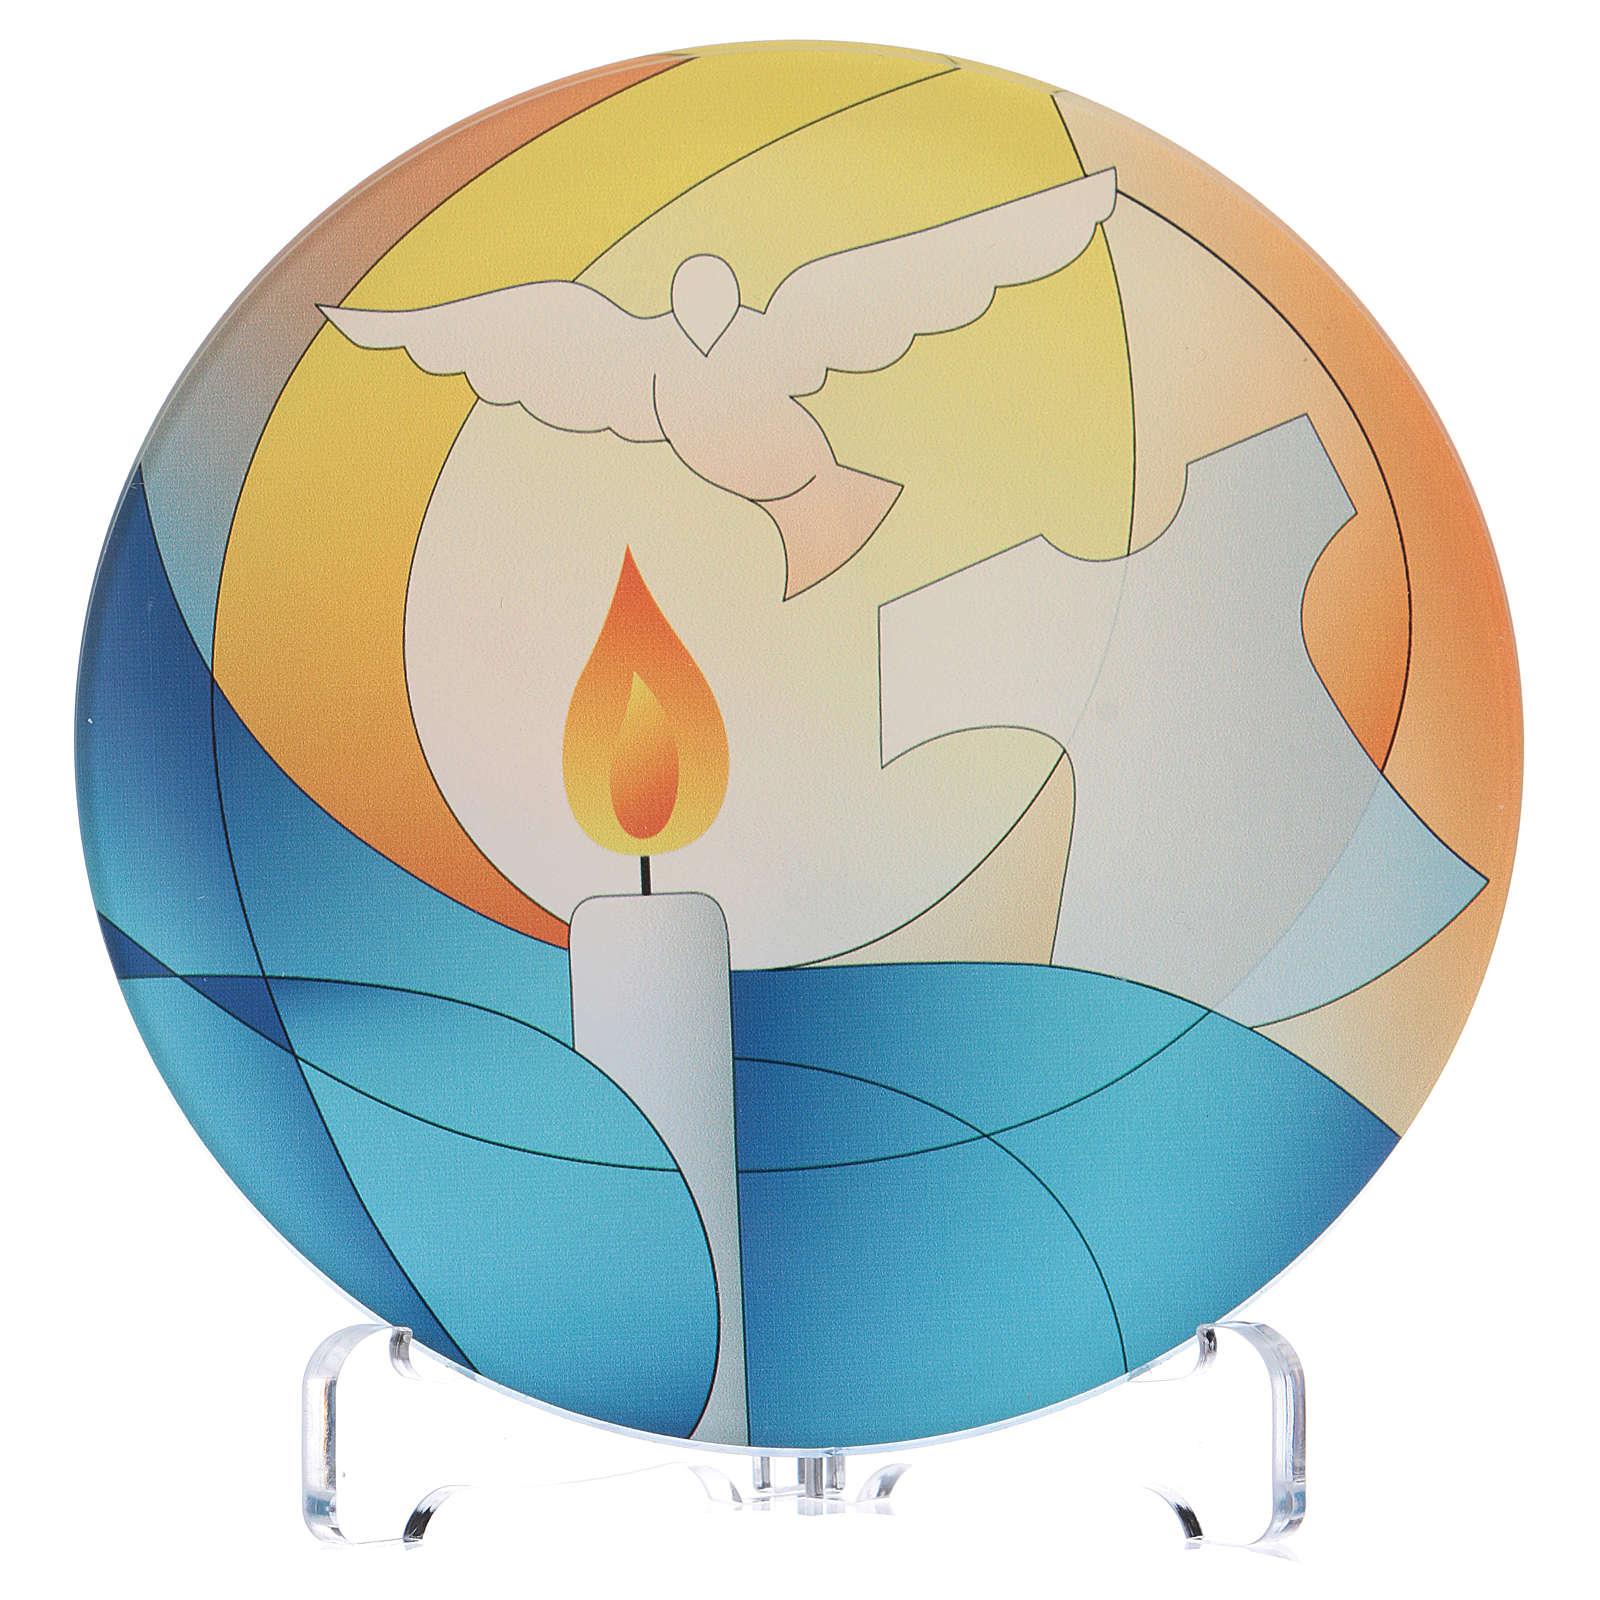 Souvenir baptême plexiglas diamètre 10 cm Centre Ave 3